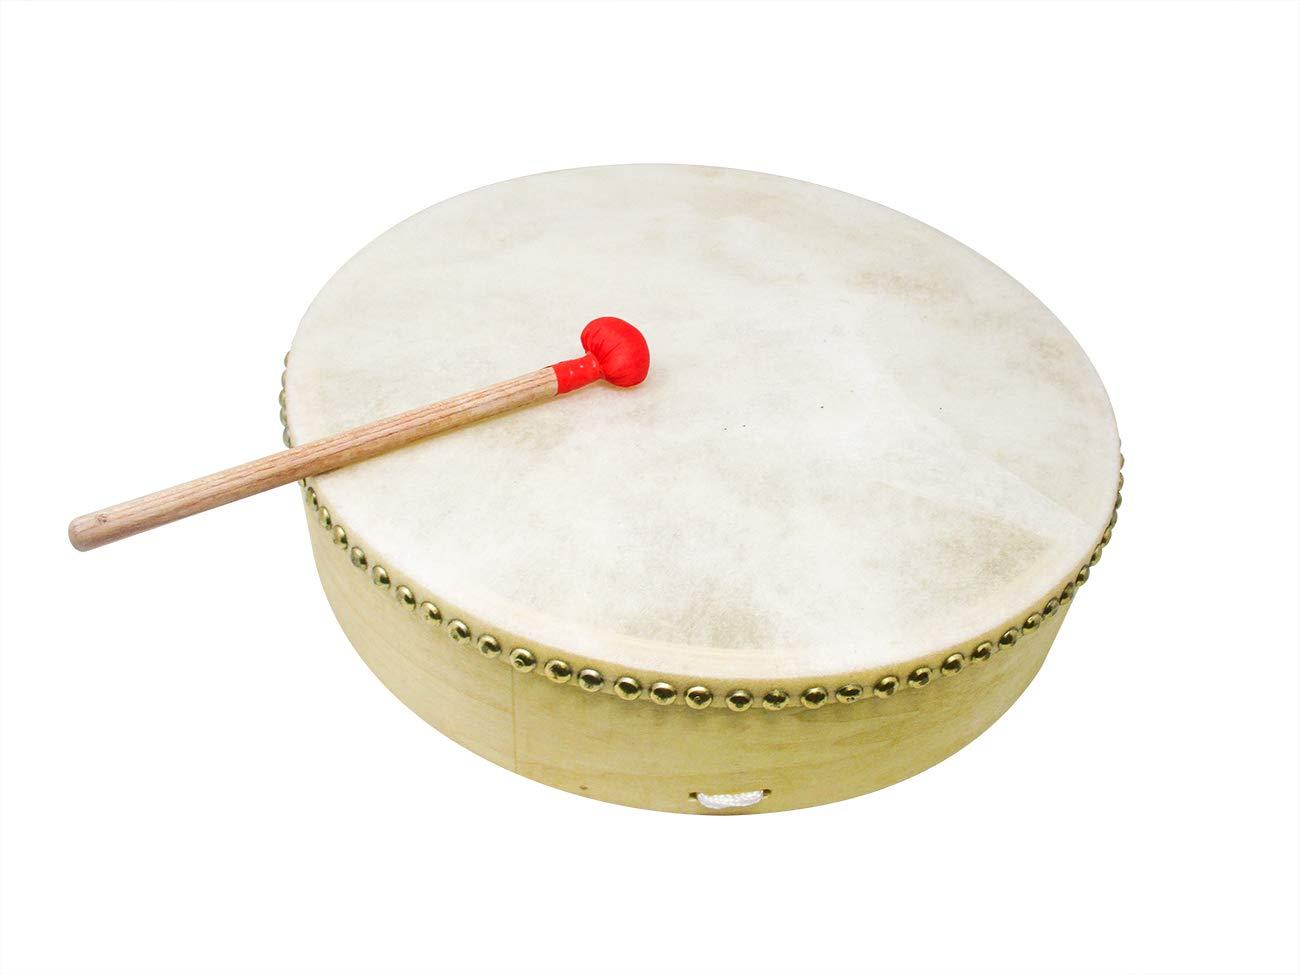 16 Inch Buffalo Tambourine Hand Drum by Trademark Innovations